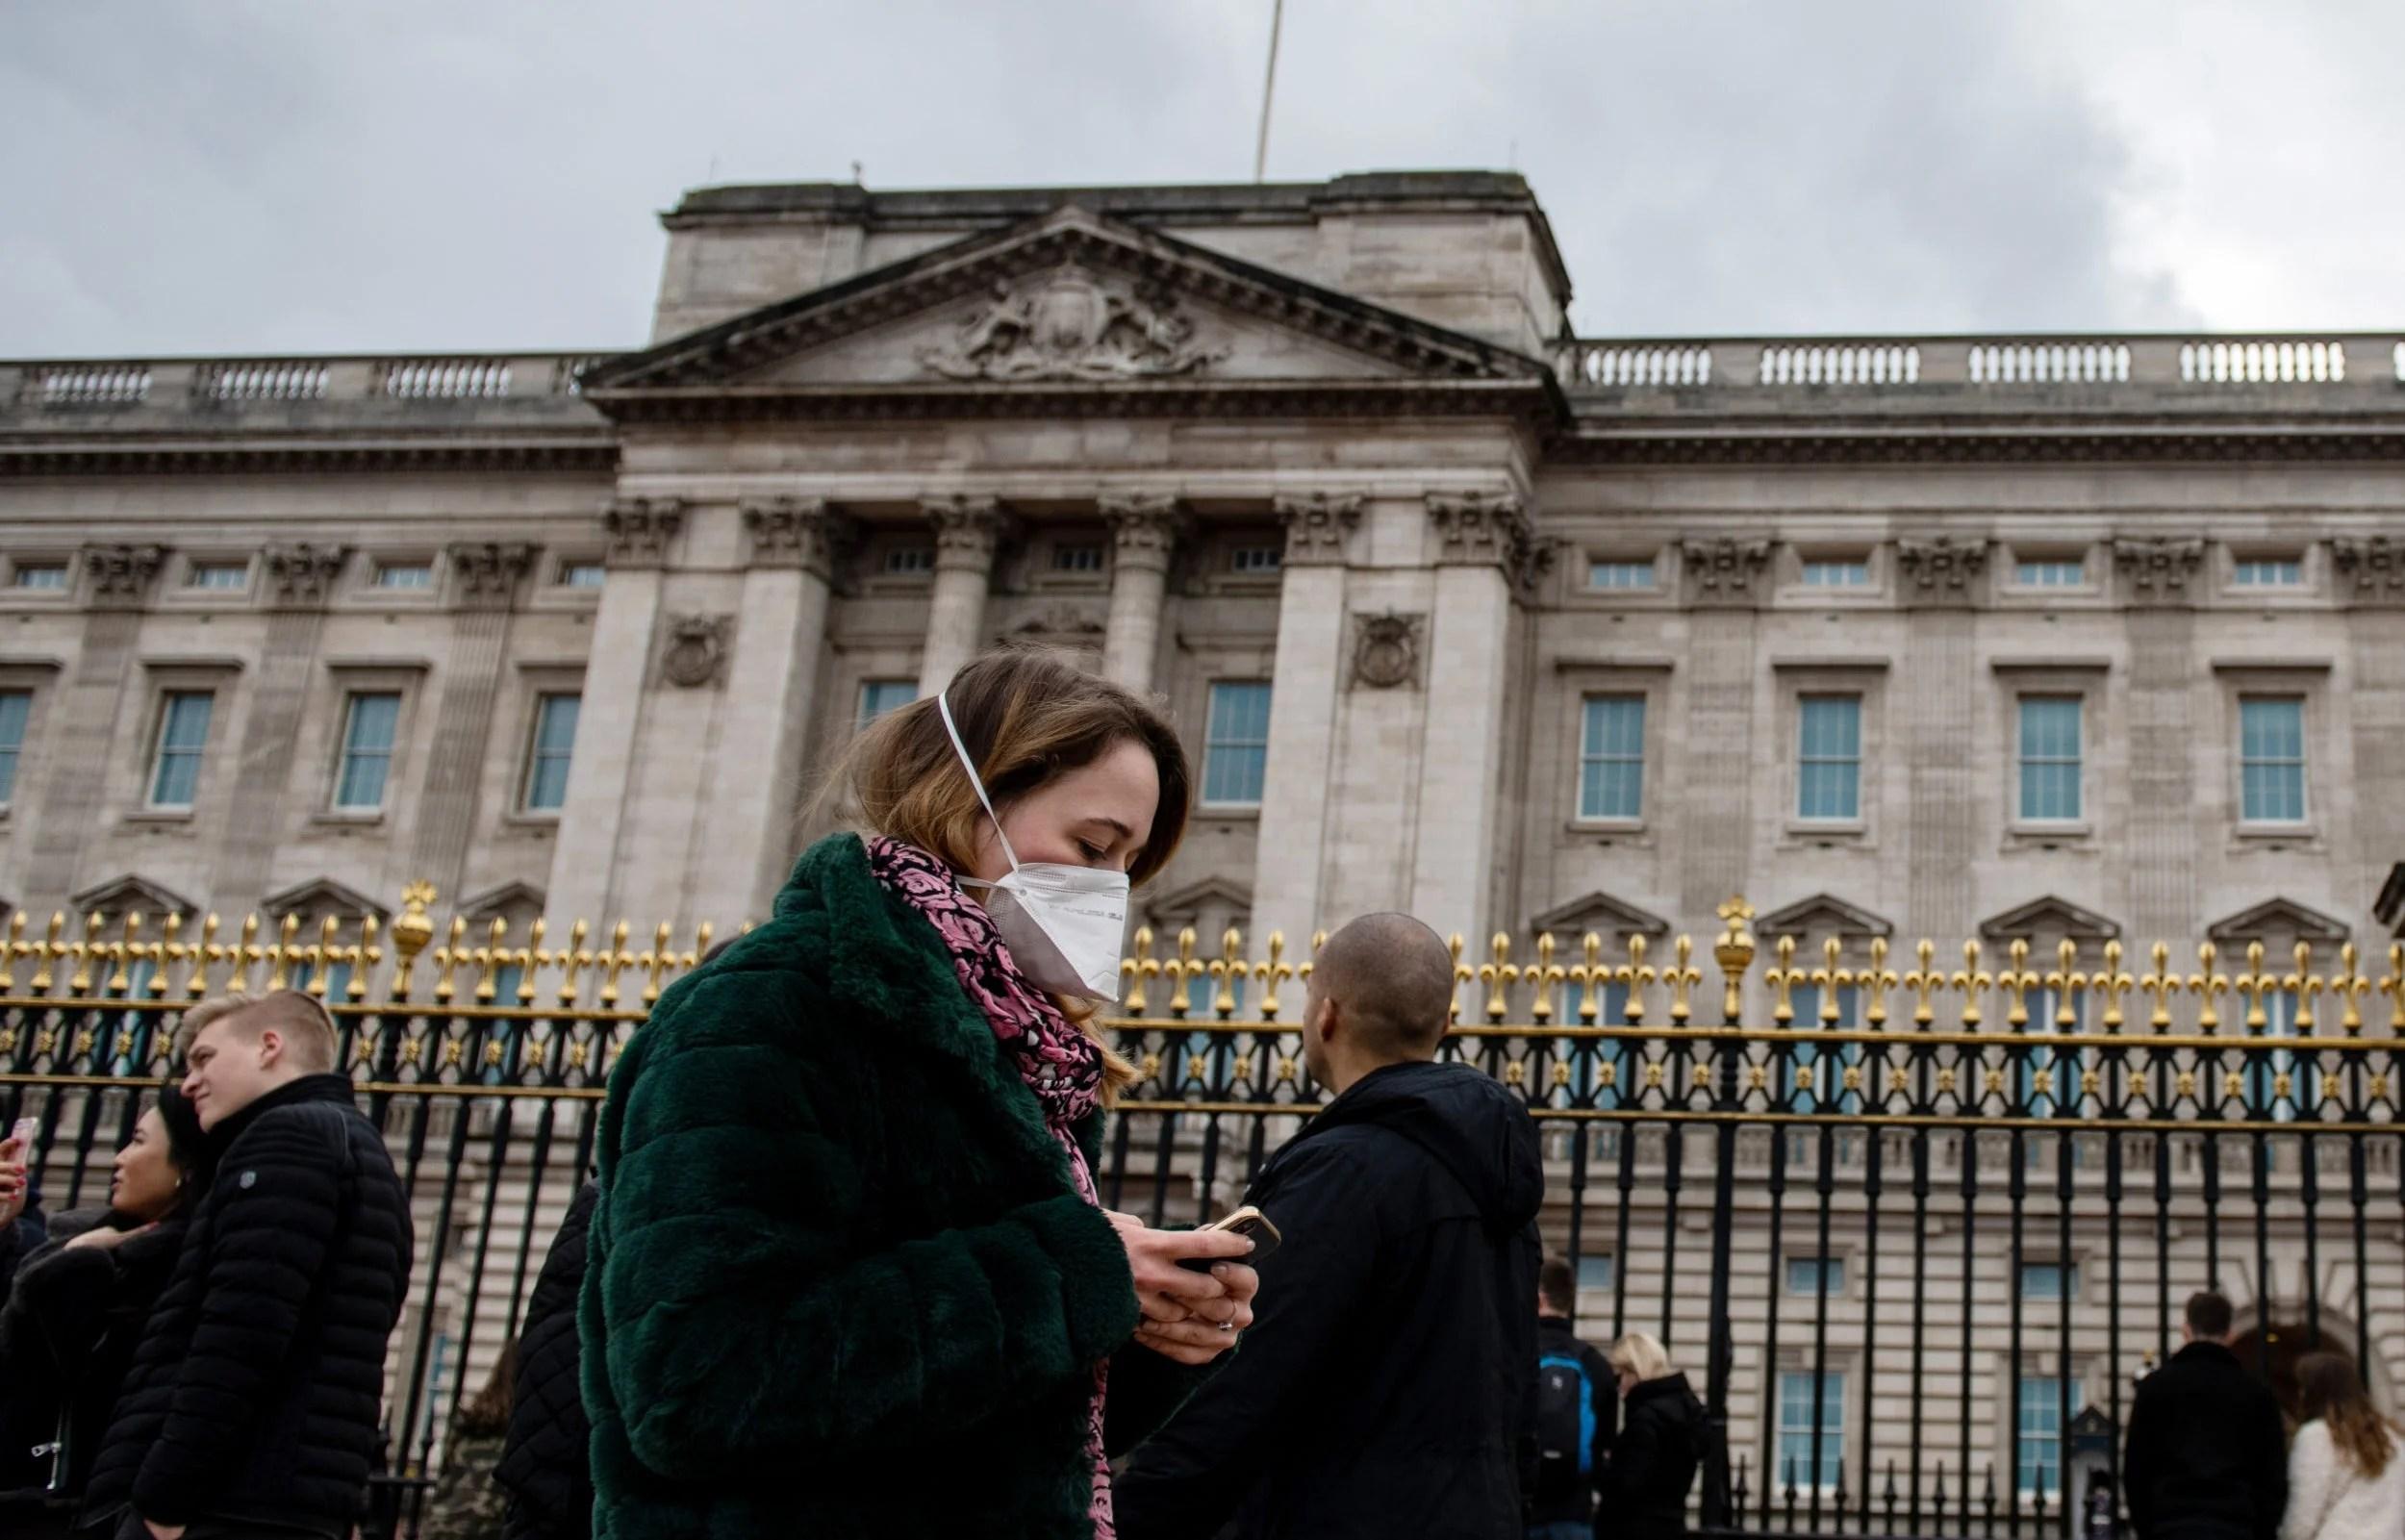 UK coronavirus news LIVE: Latest updates as 14 more patients die ...